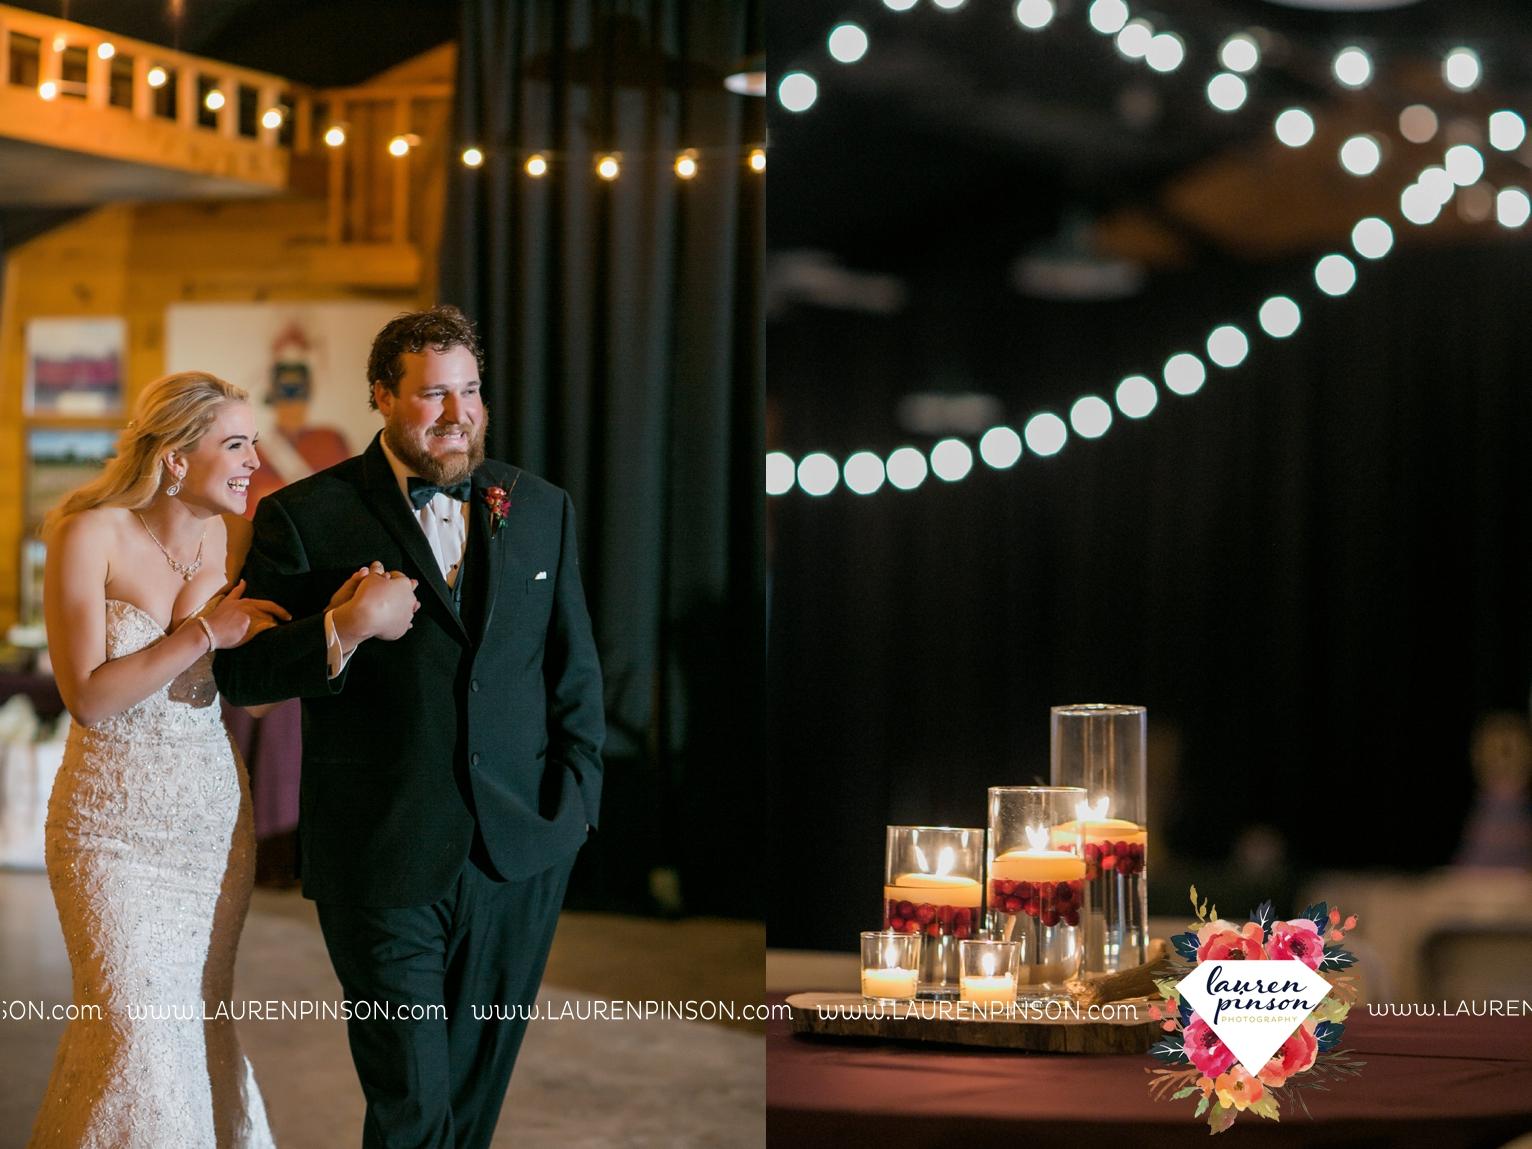 rustic-wichita-falls-texas-wedding-photographer-gold-glam-mayfield-events-market-street-united-allue-bridals-fall_1779.jpg